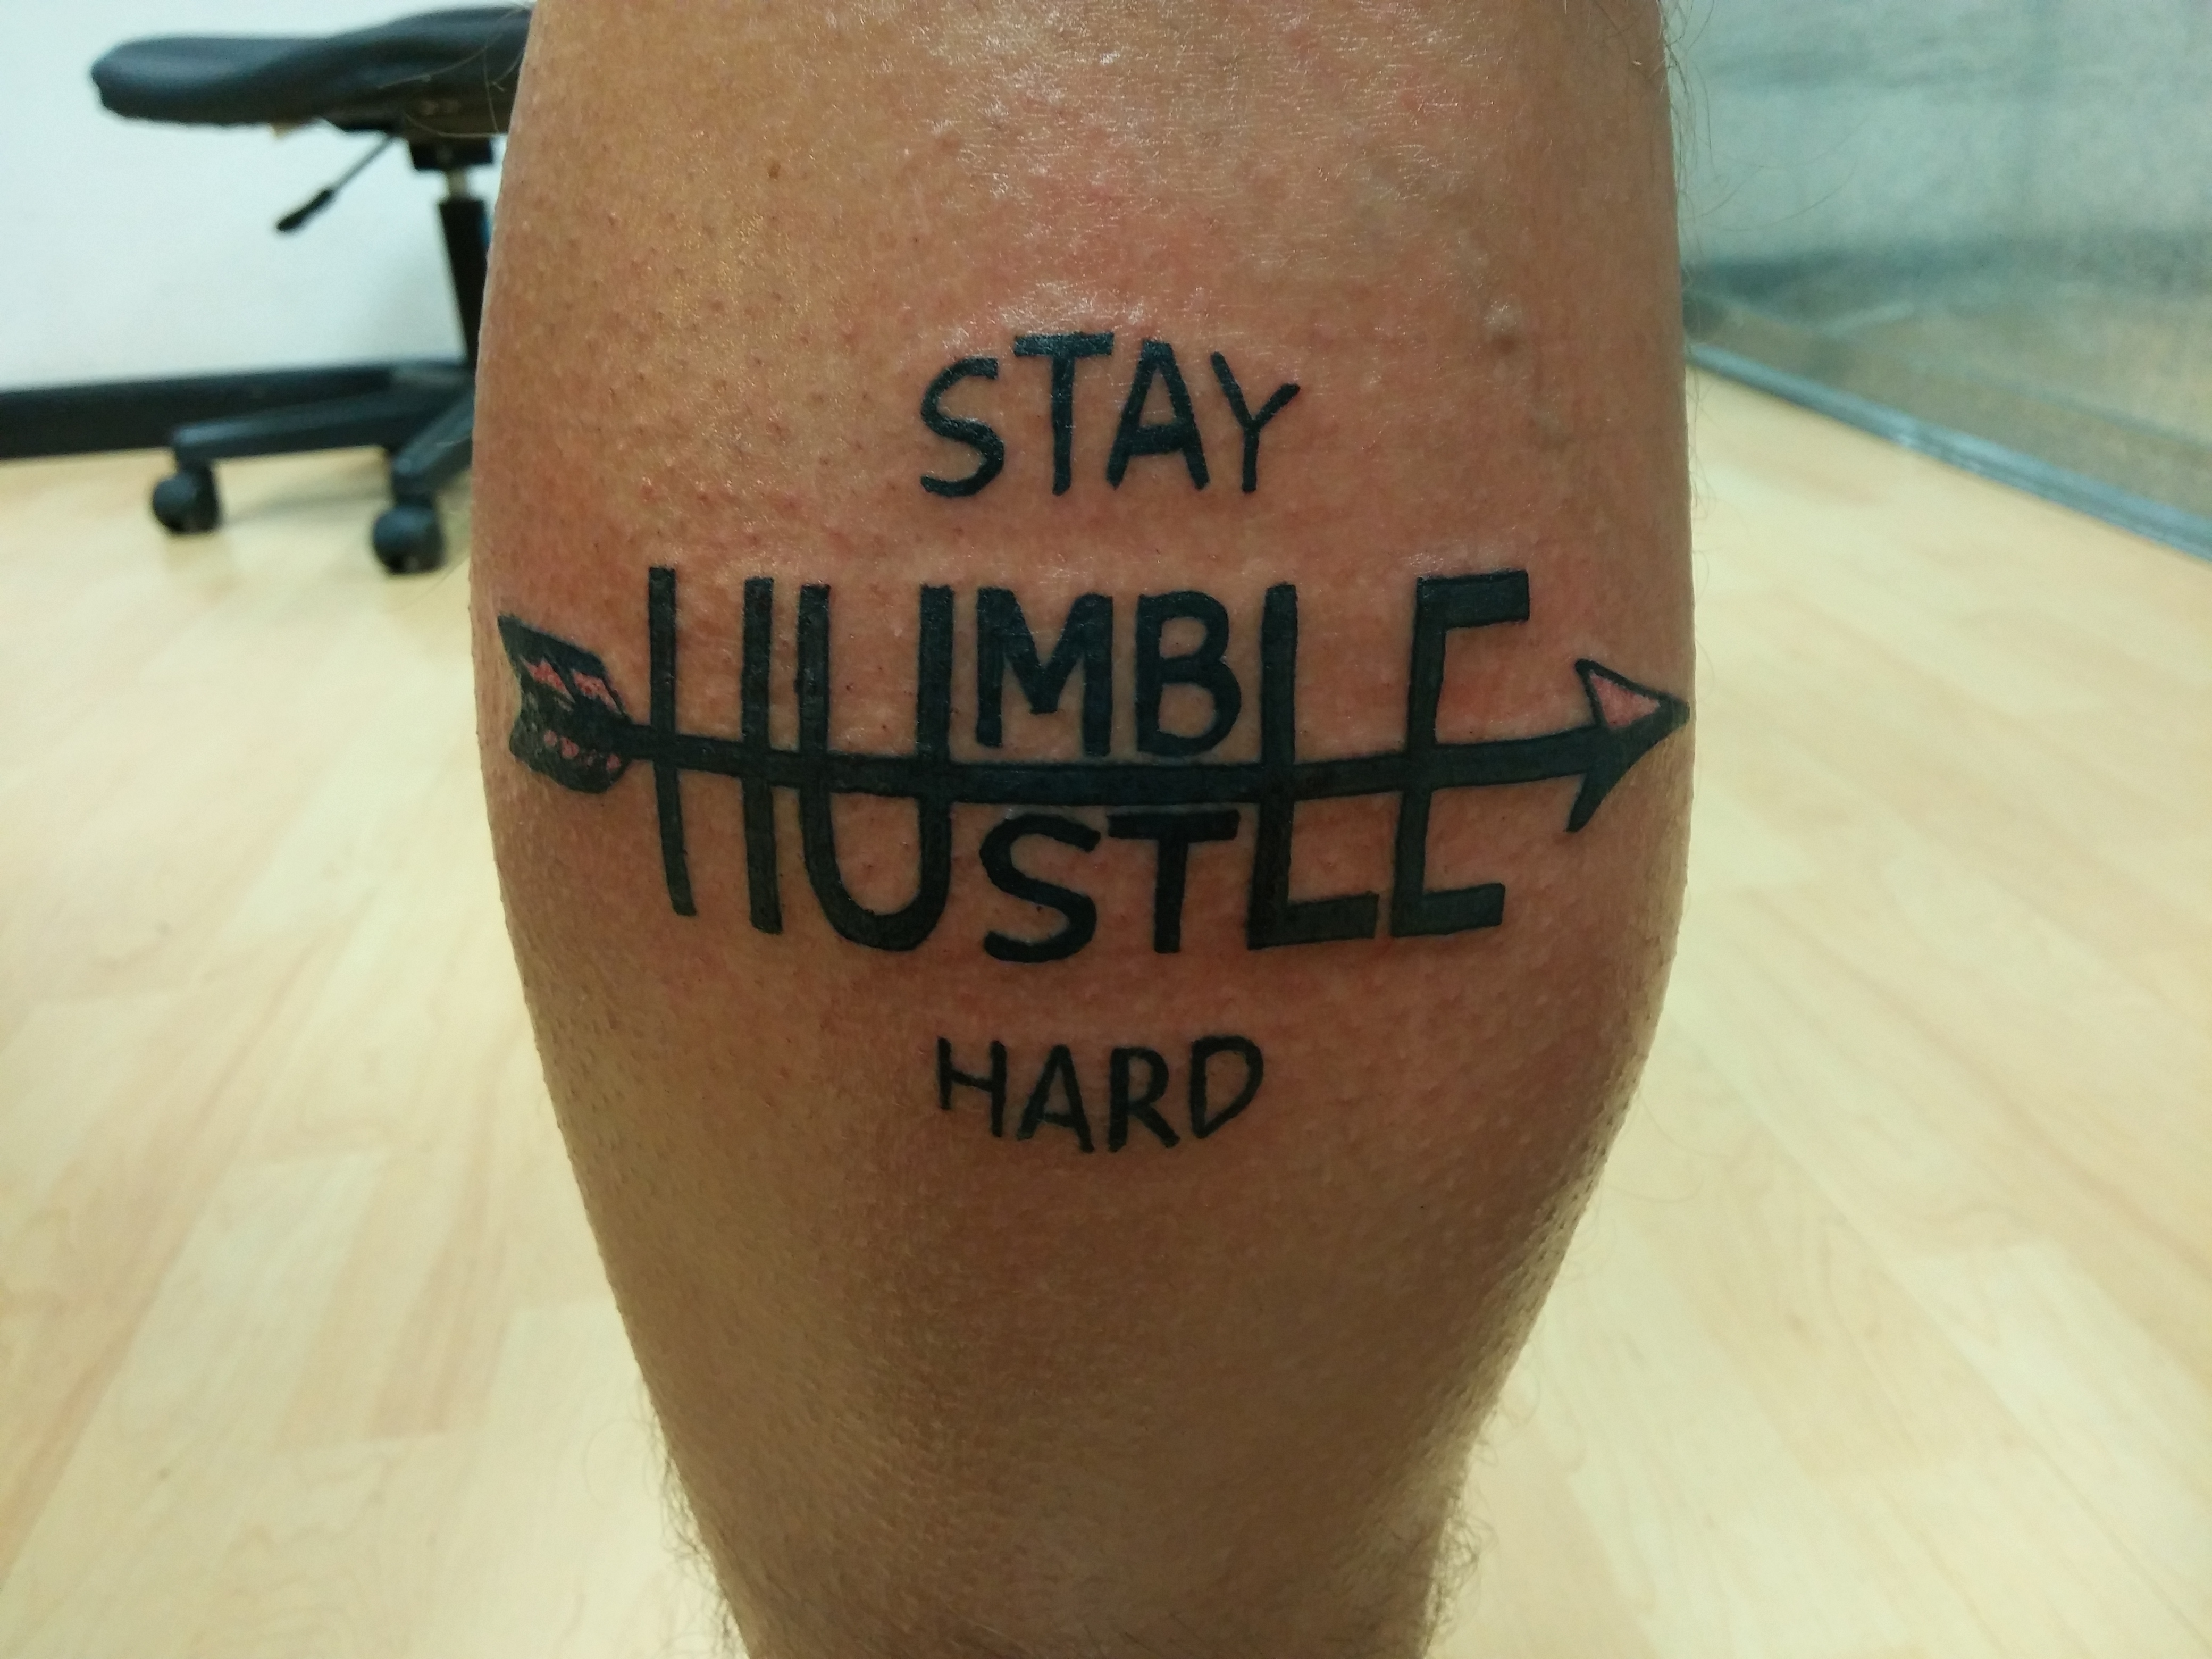 Dhumble